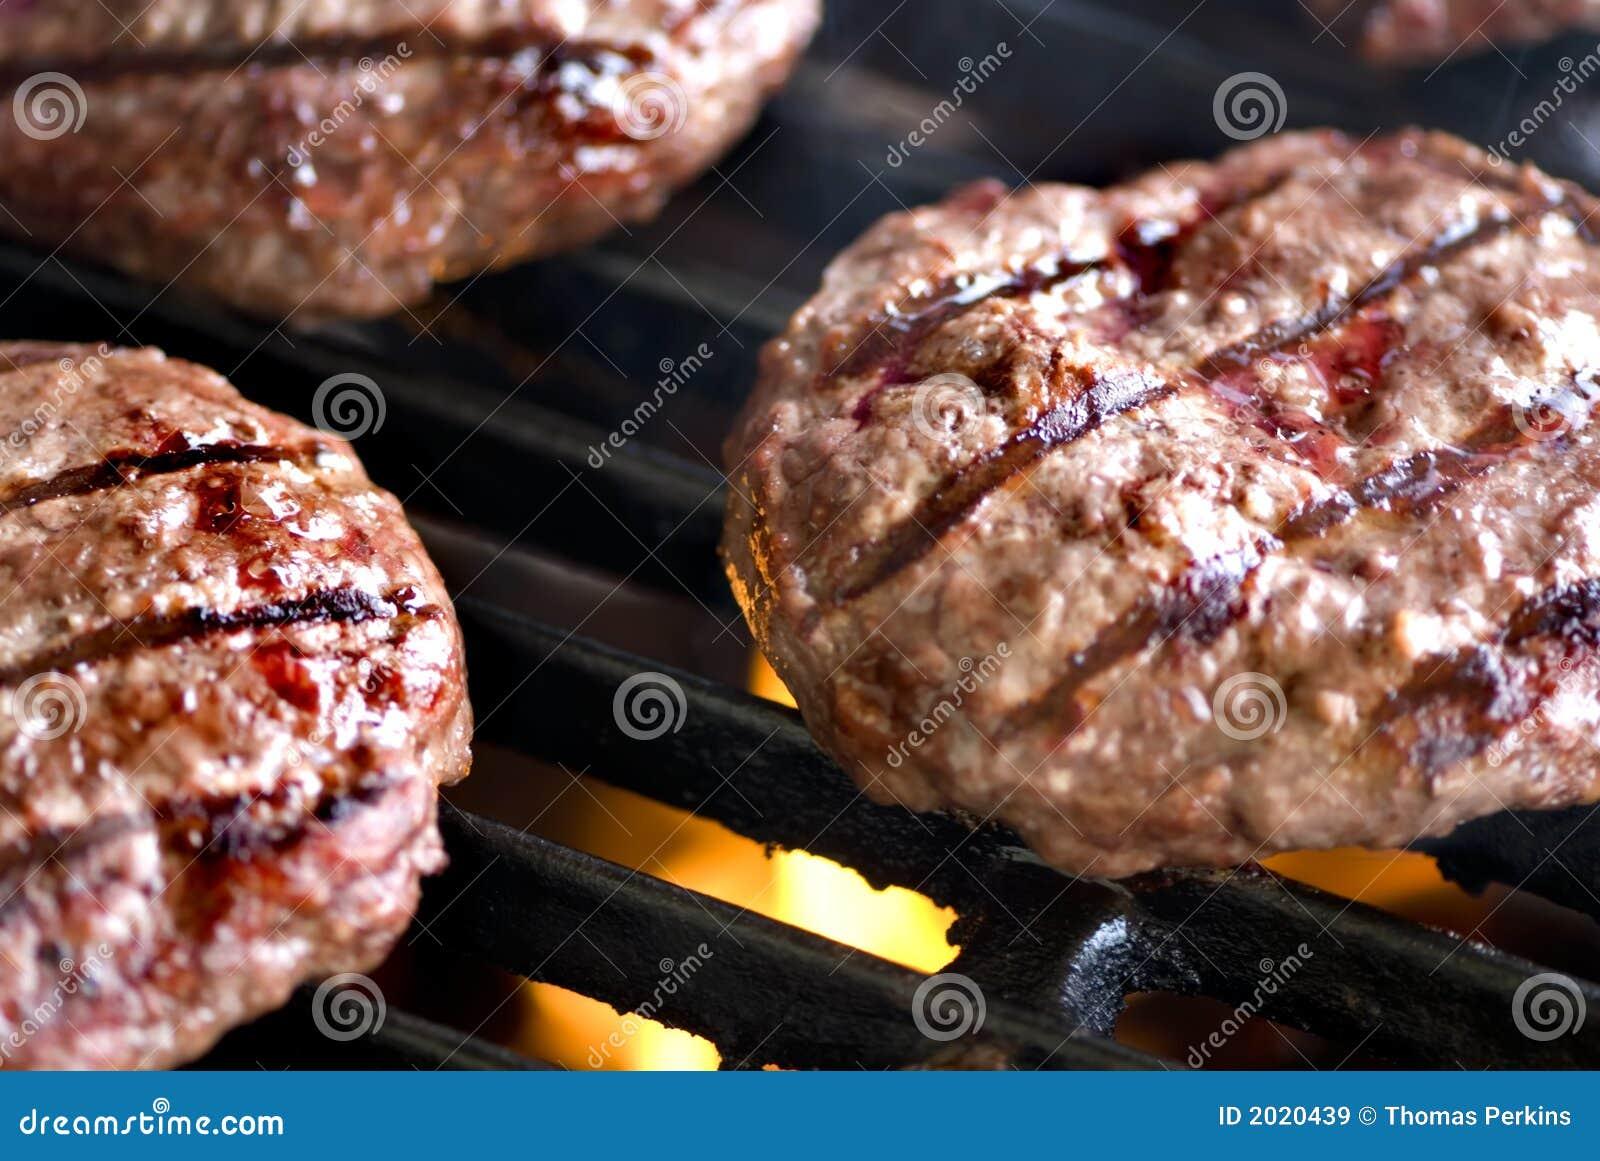 Hamburger Series (grilling burgers)